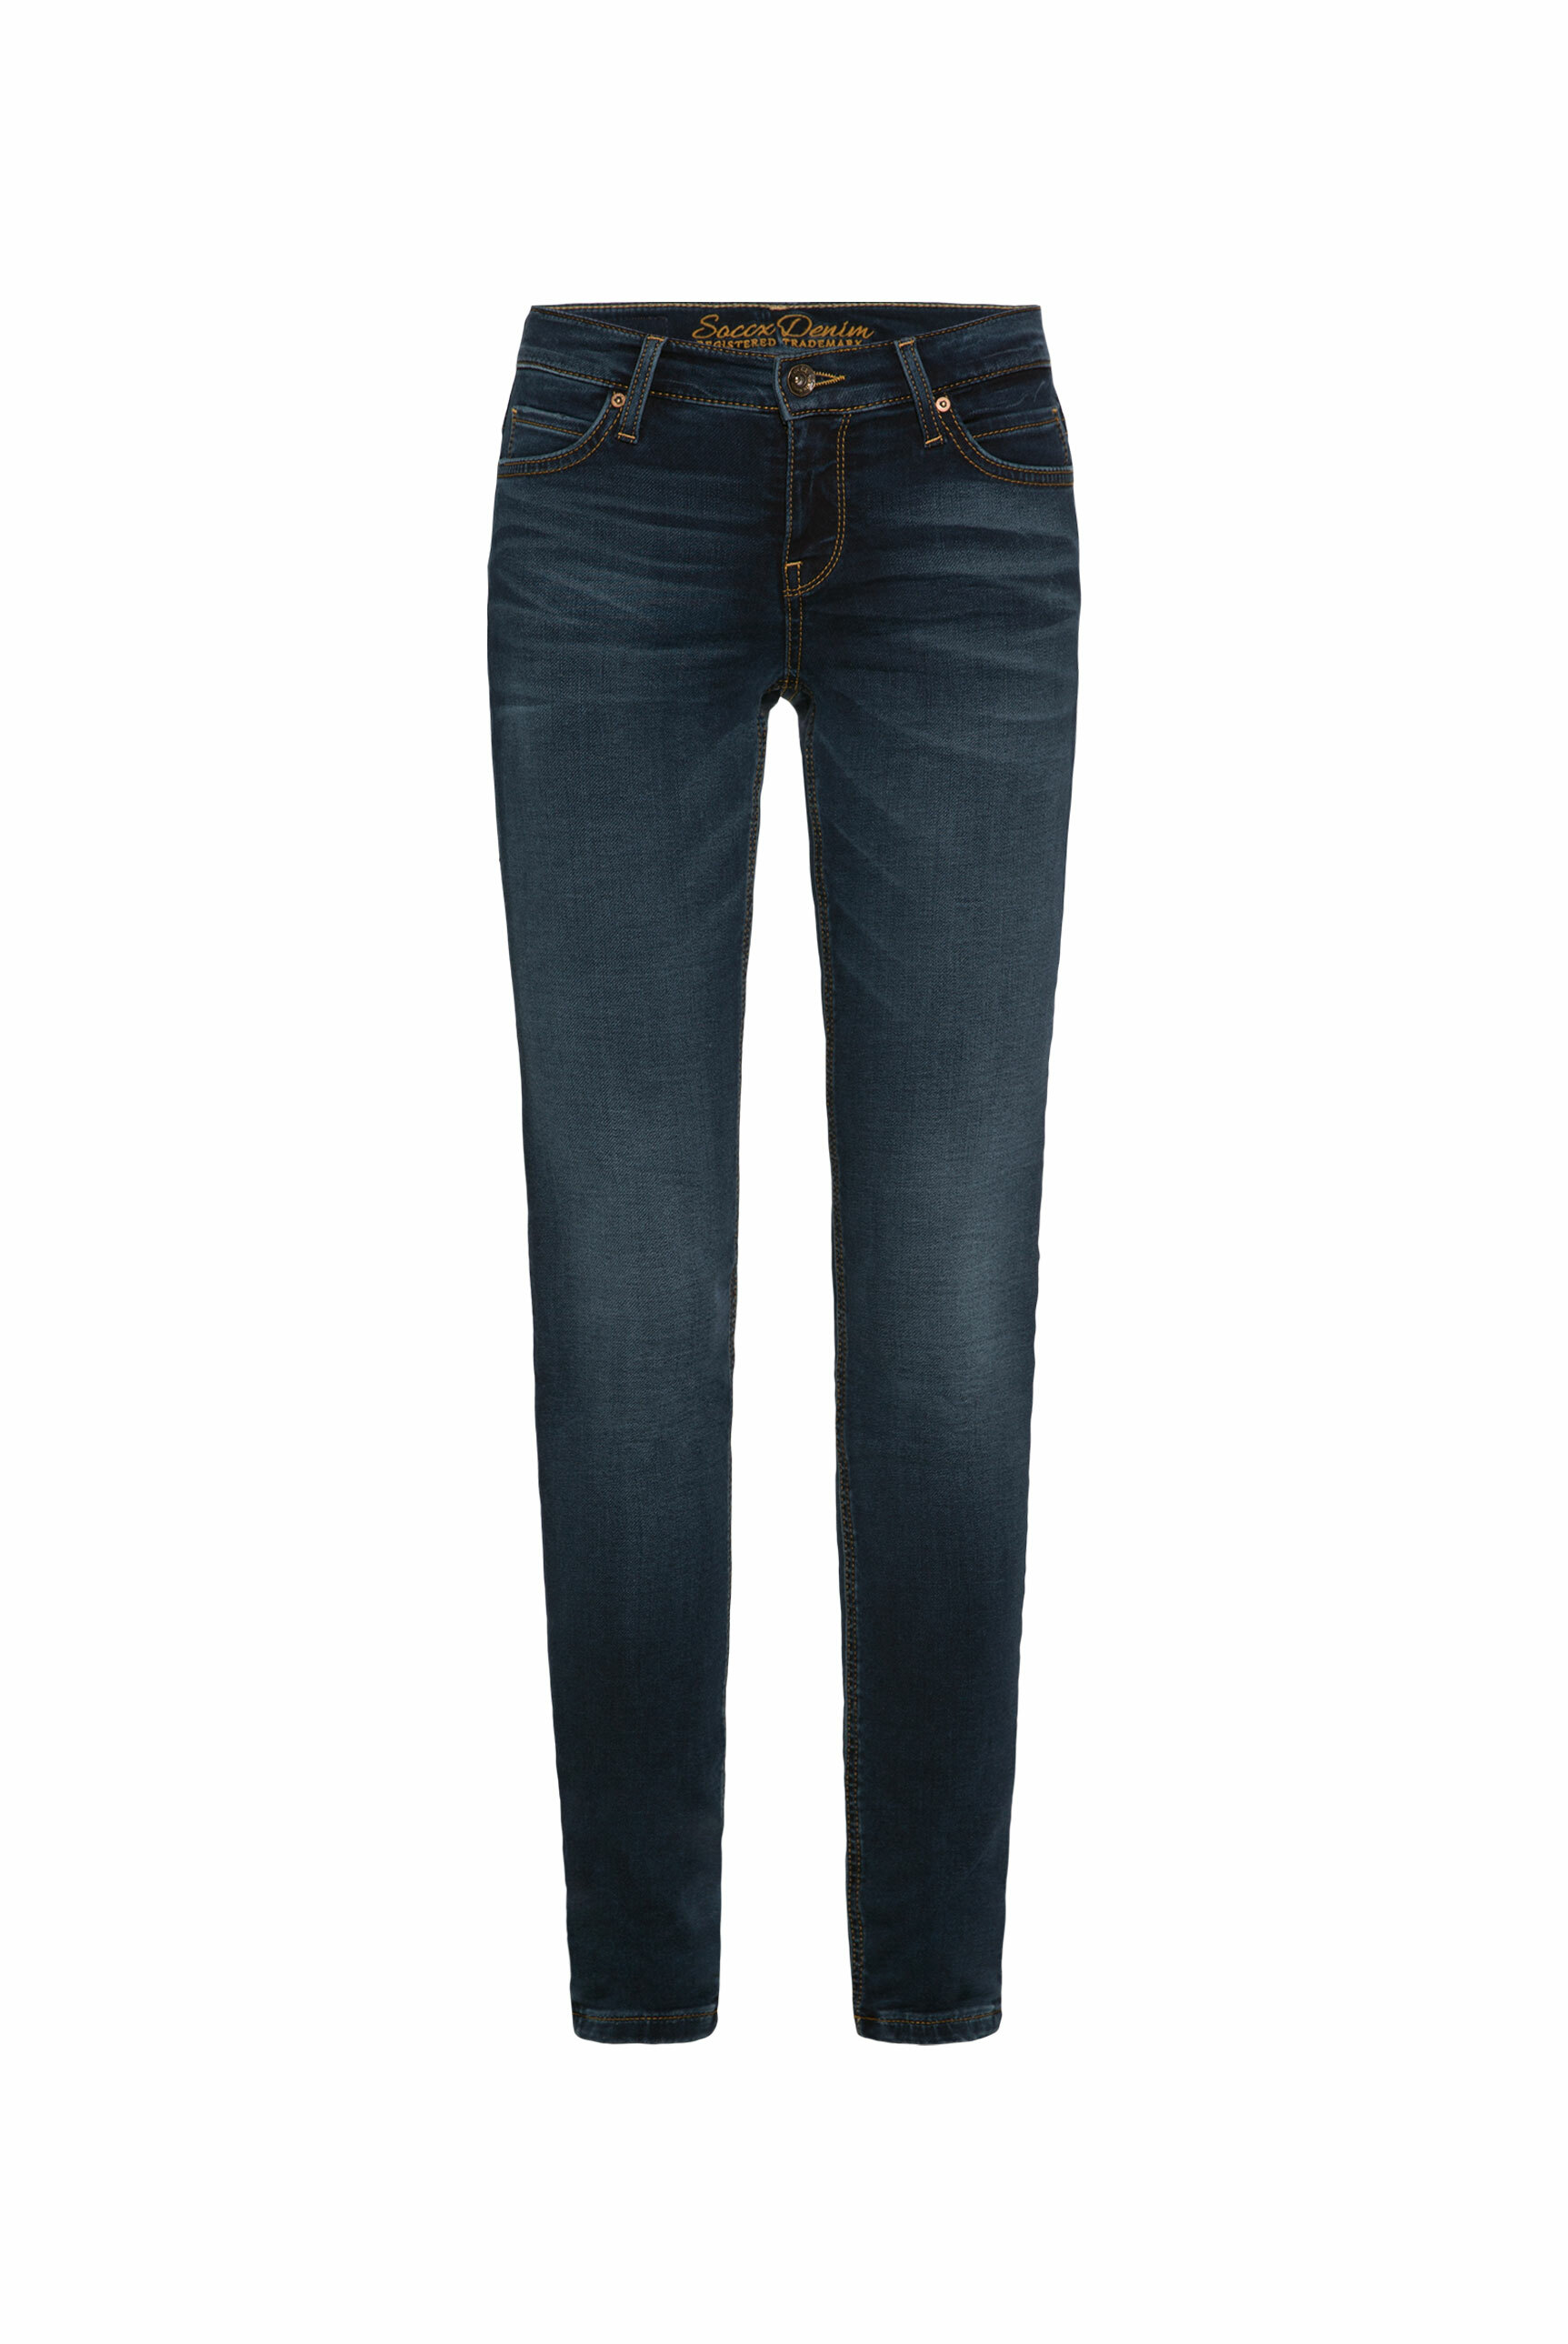 CAMP DAVID & SOCCX   Slim Fit Jeans HE:DI in Grey Used